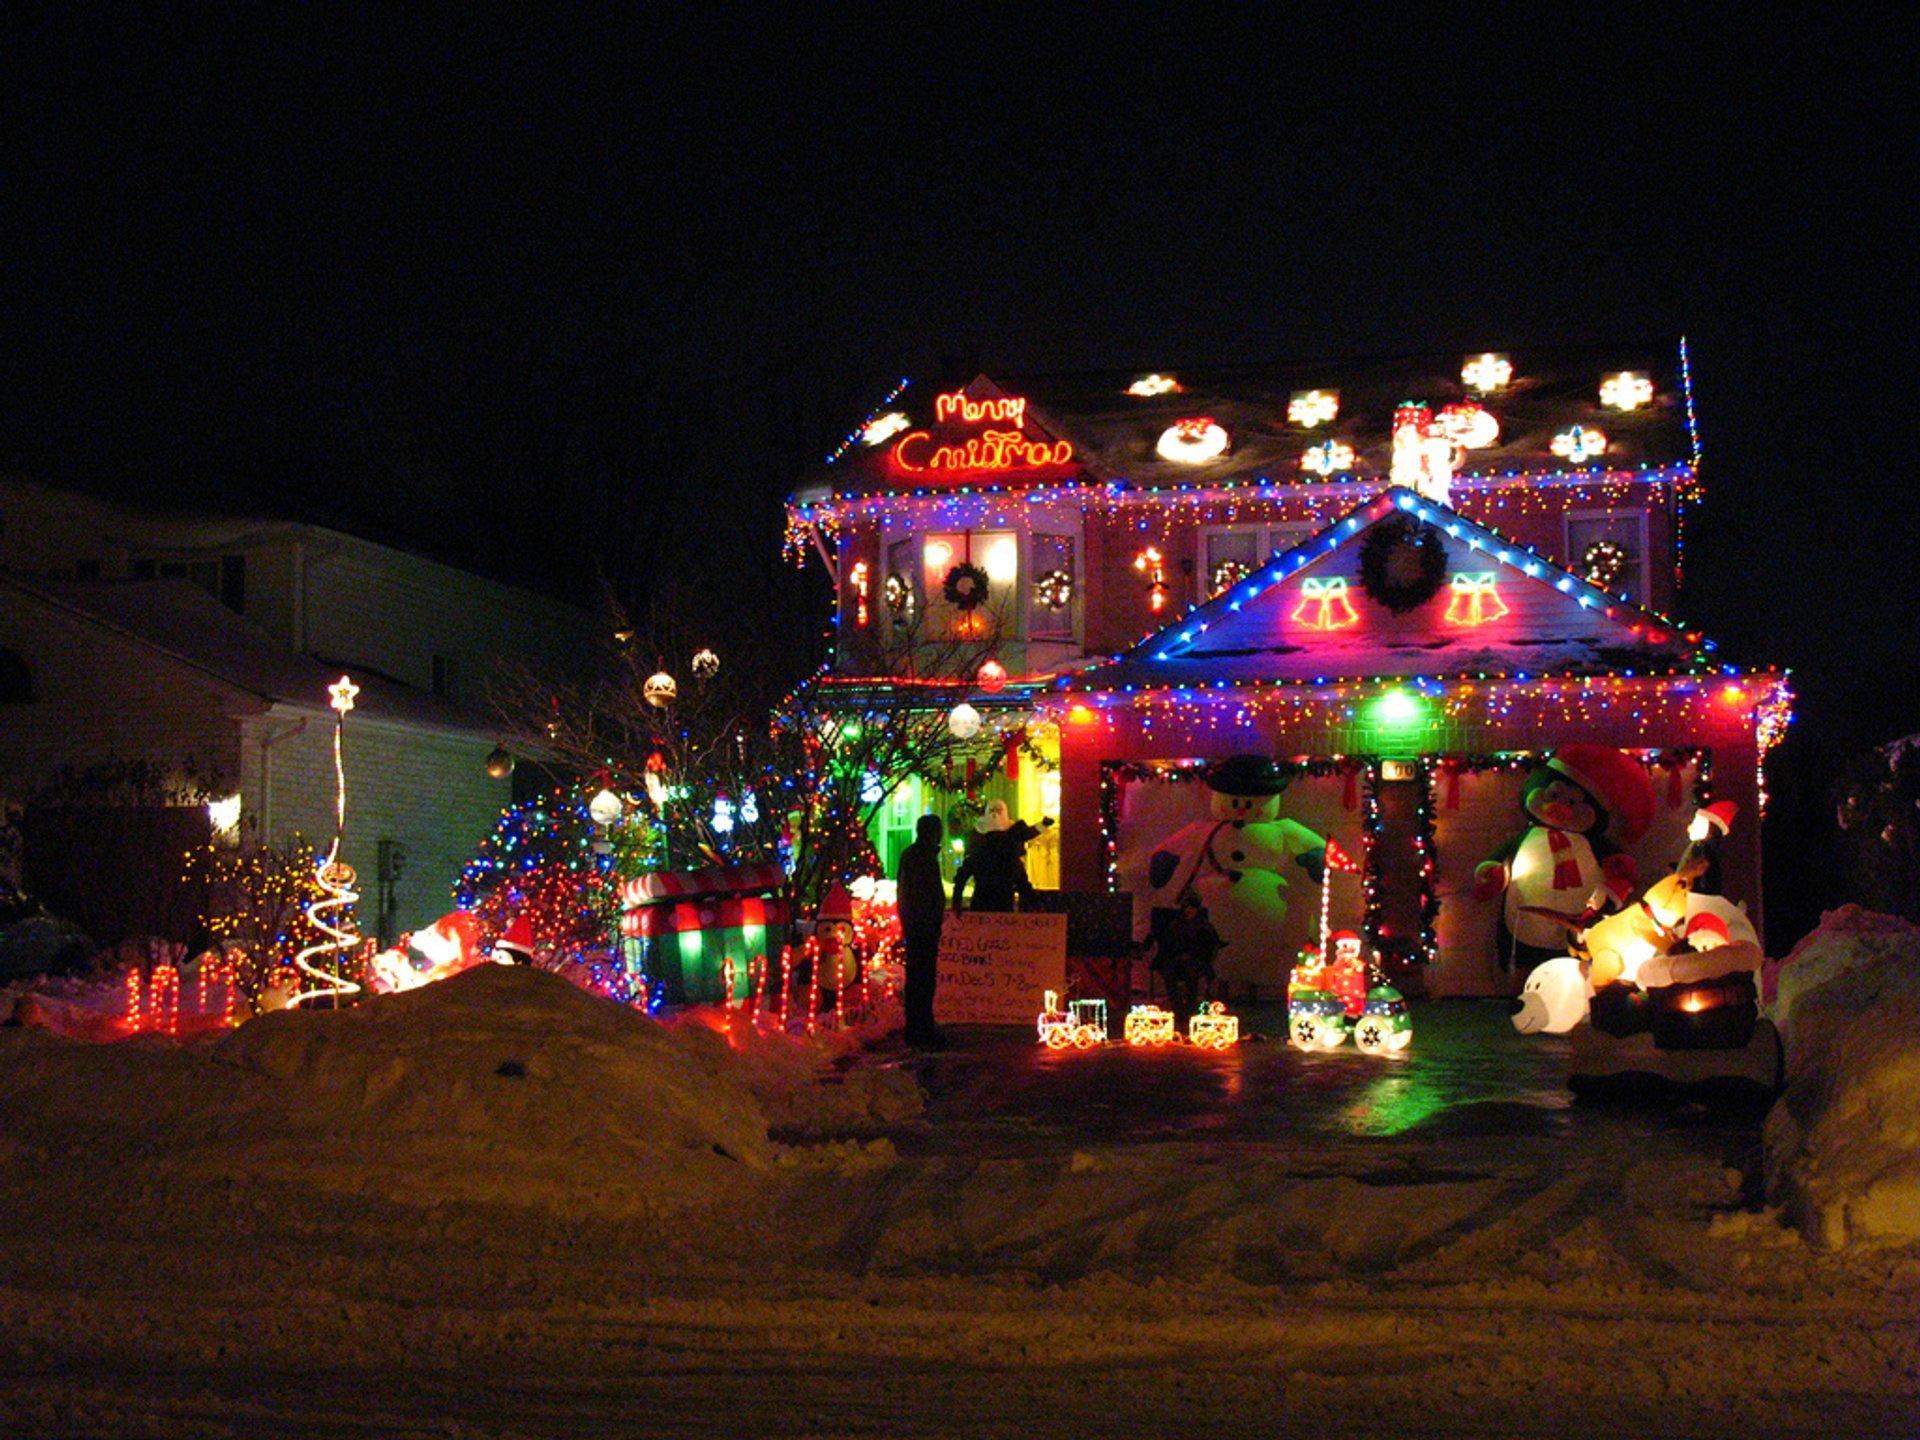 Best Christmas Light Displays Near Me Mn 2021 Christmas Lights In London Ontario 2021 Dates